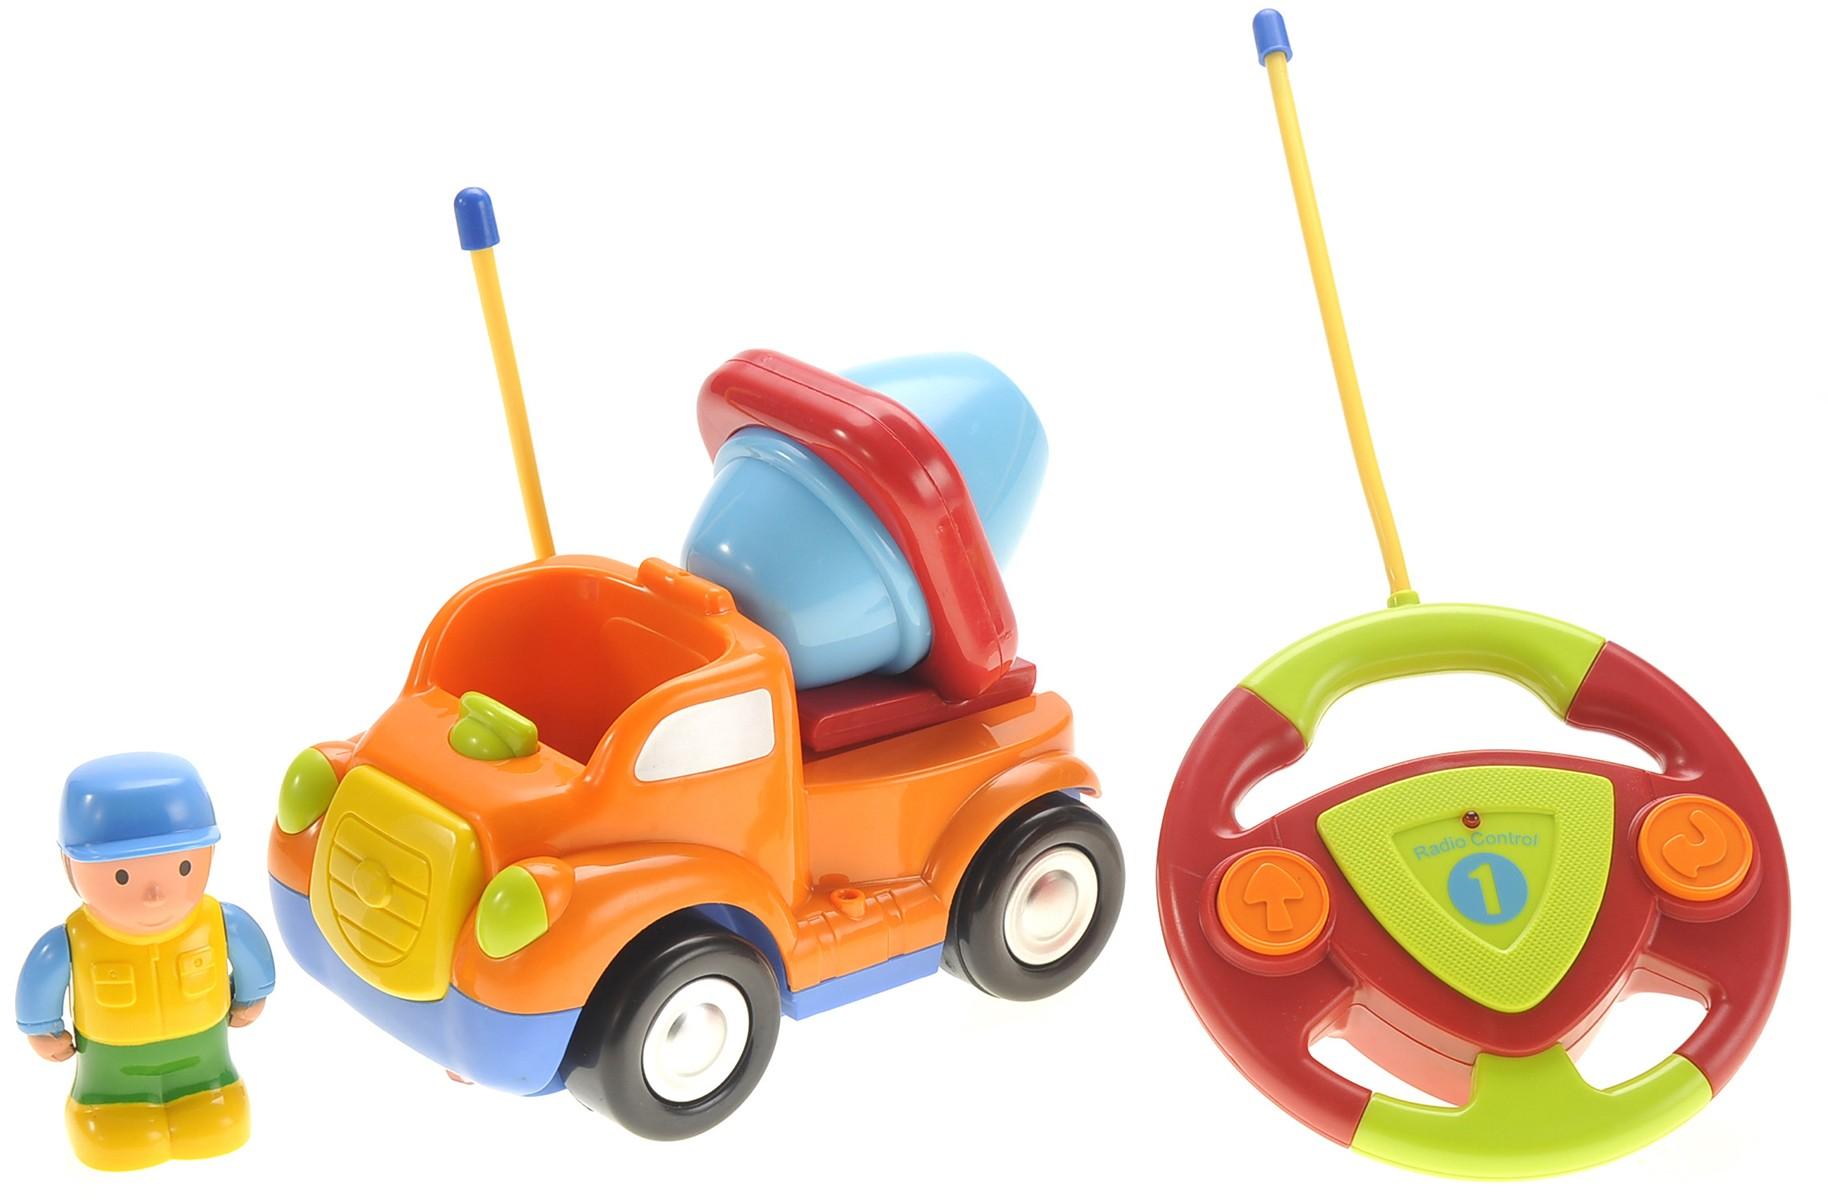 Cartoon R/C Construction Car for Kids Orange